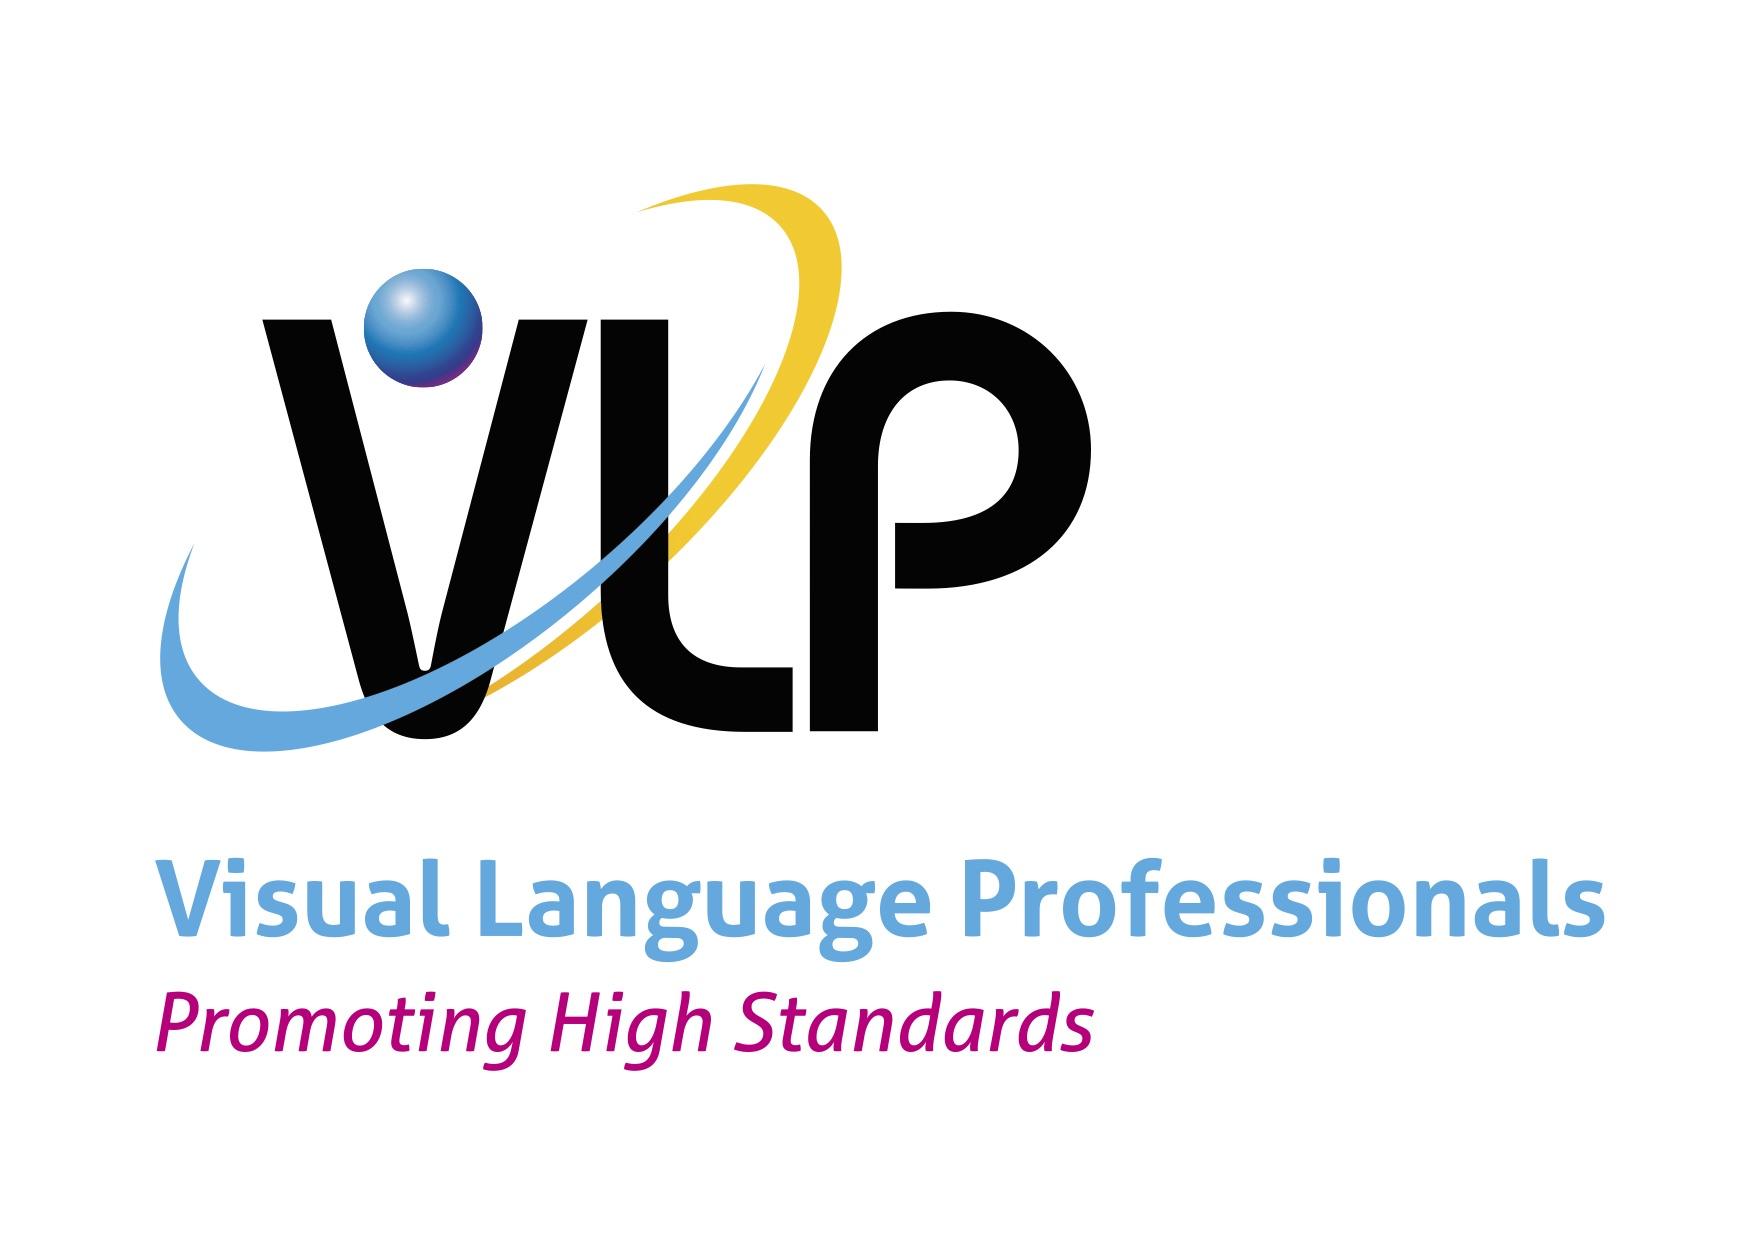 VLP Conference 2017